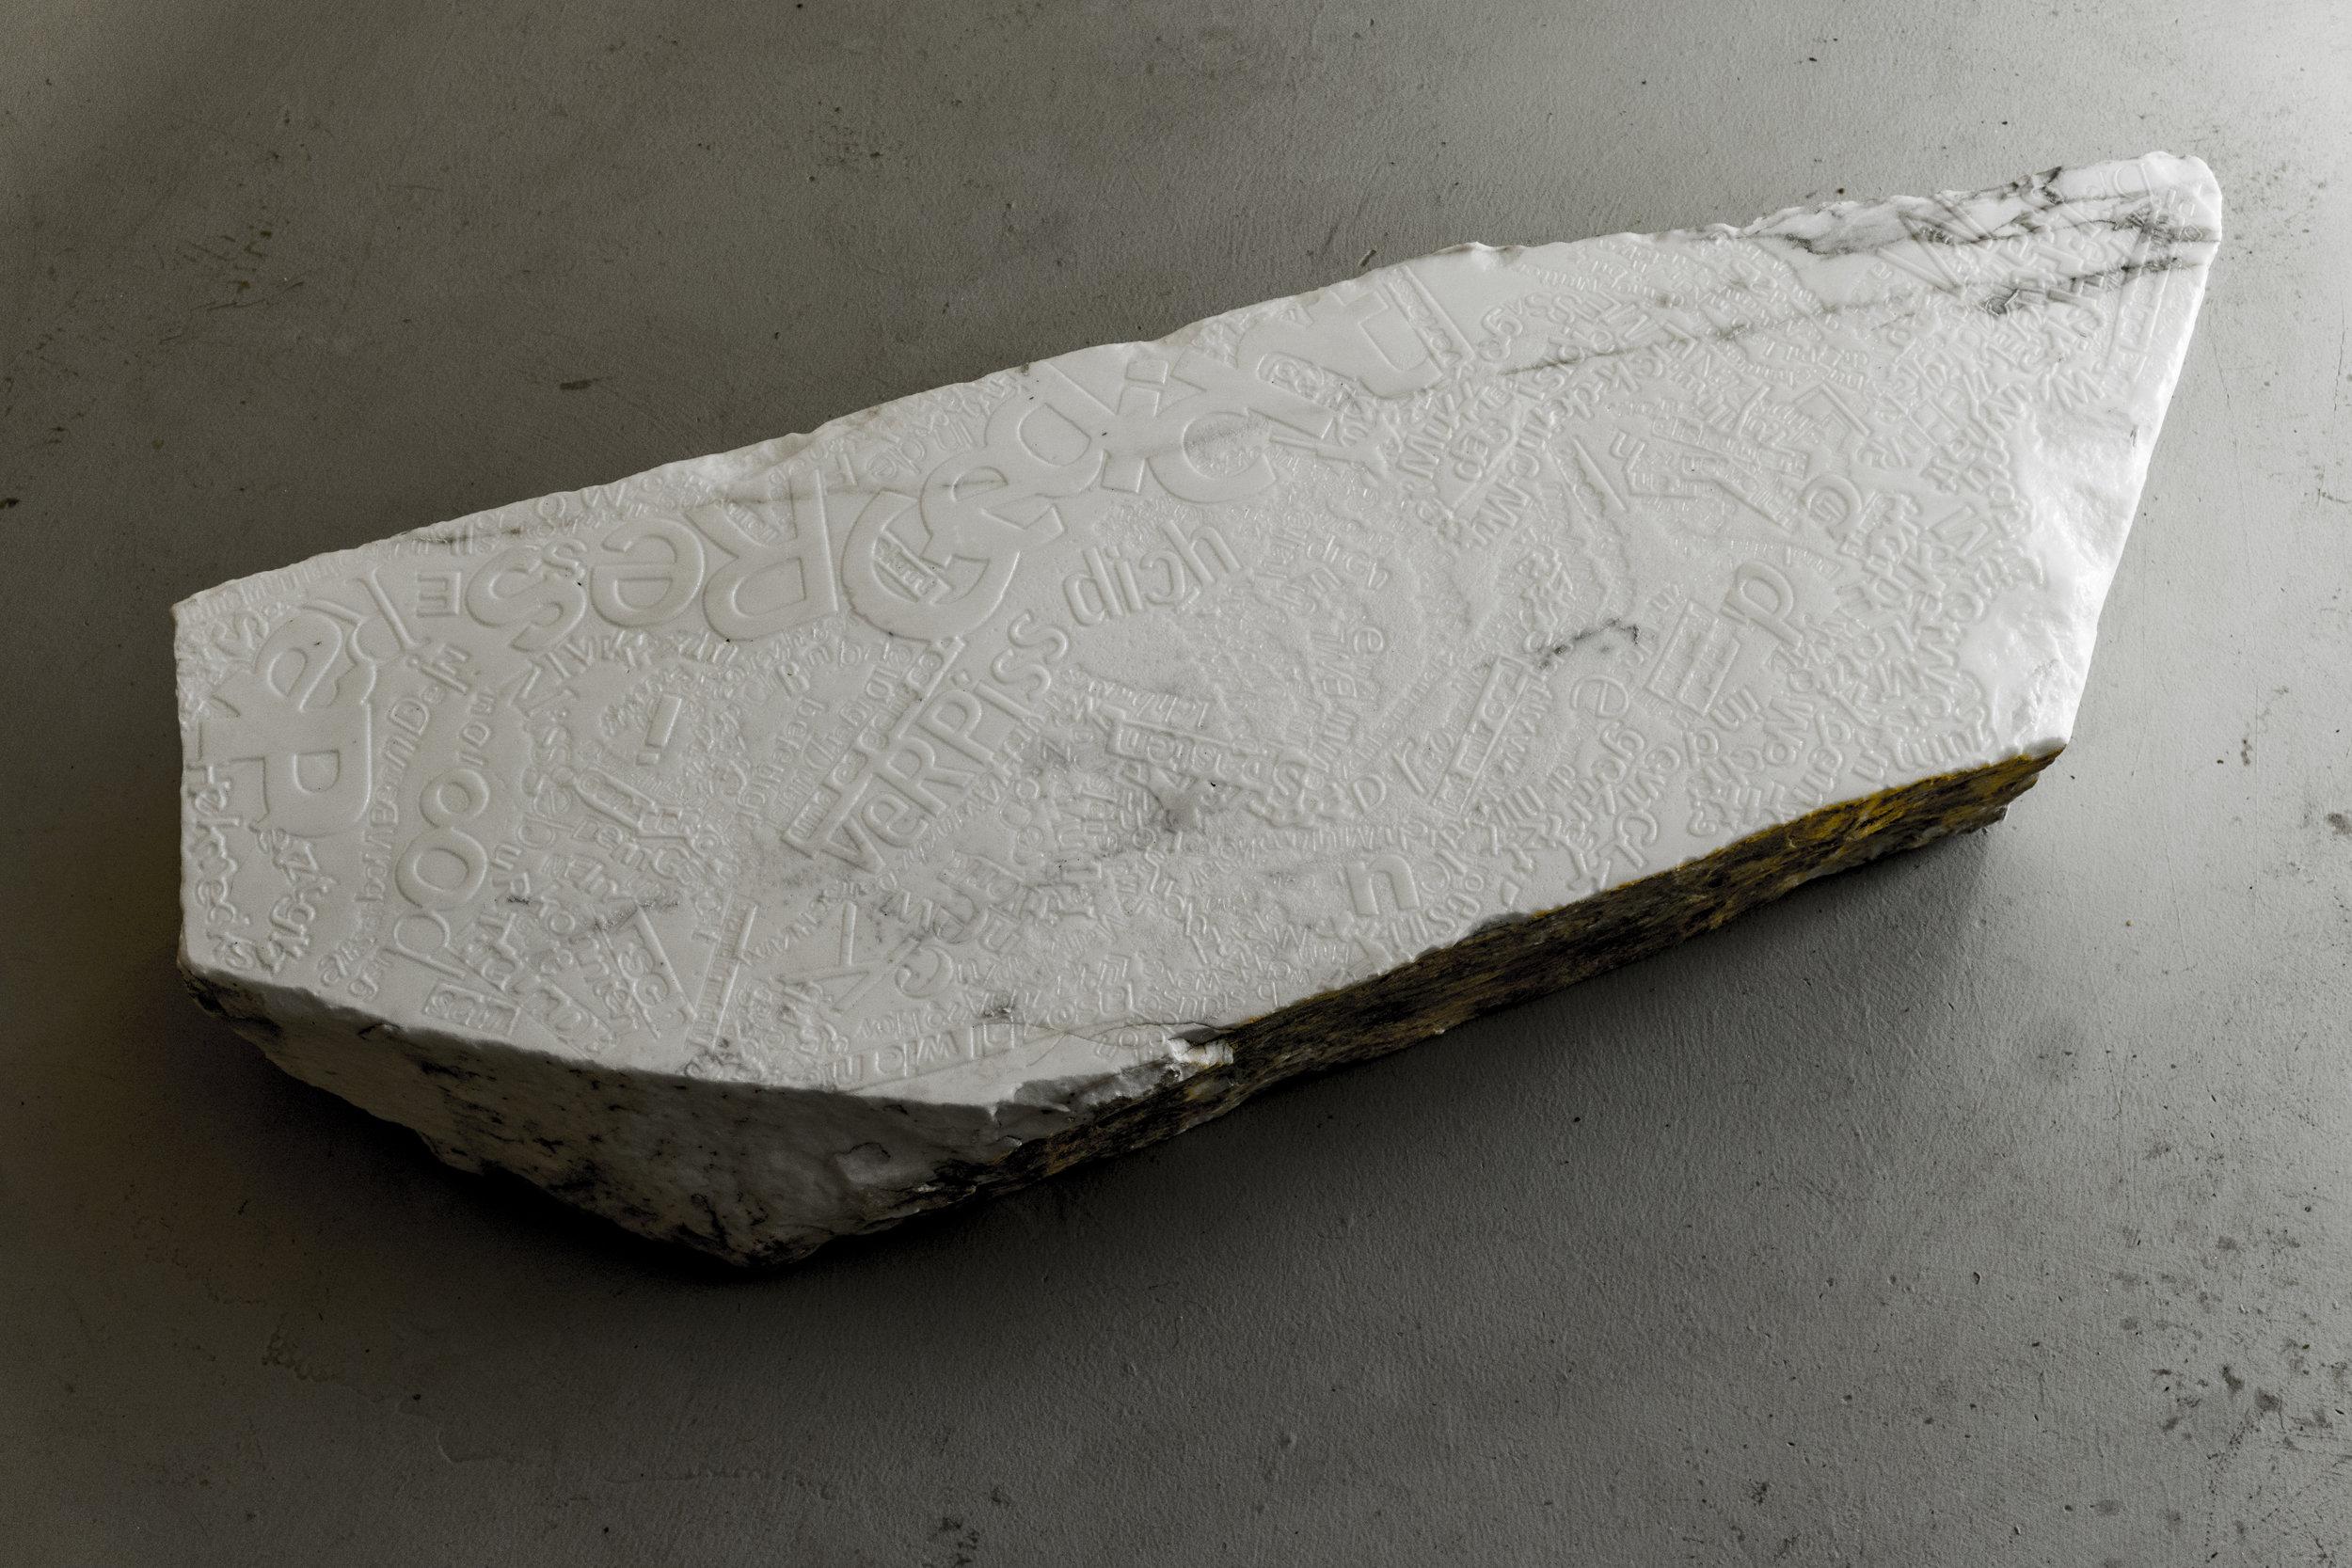 lukas liese punchlines marmor marble text relief rap sculpture.jpg